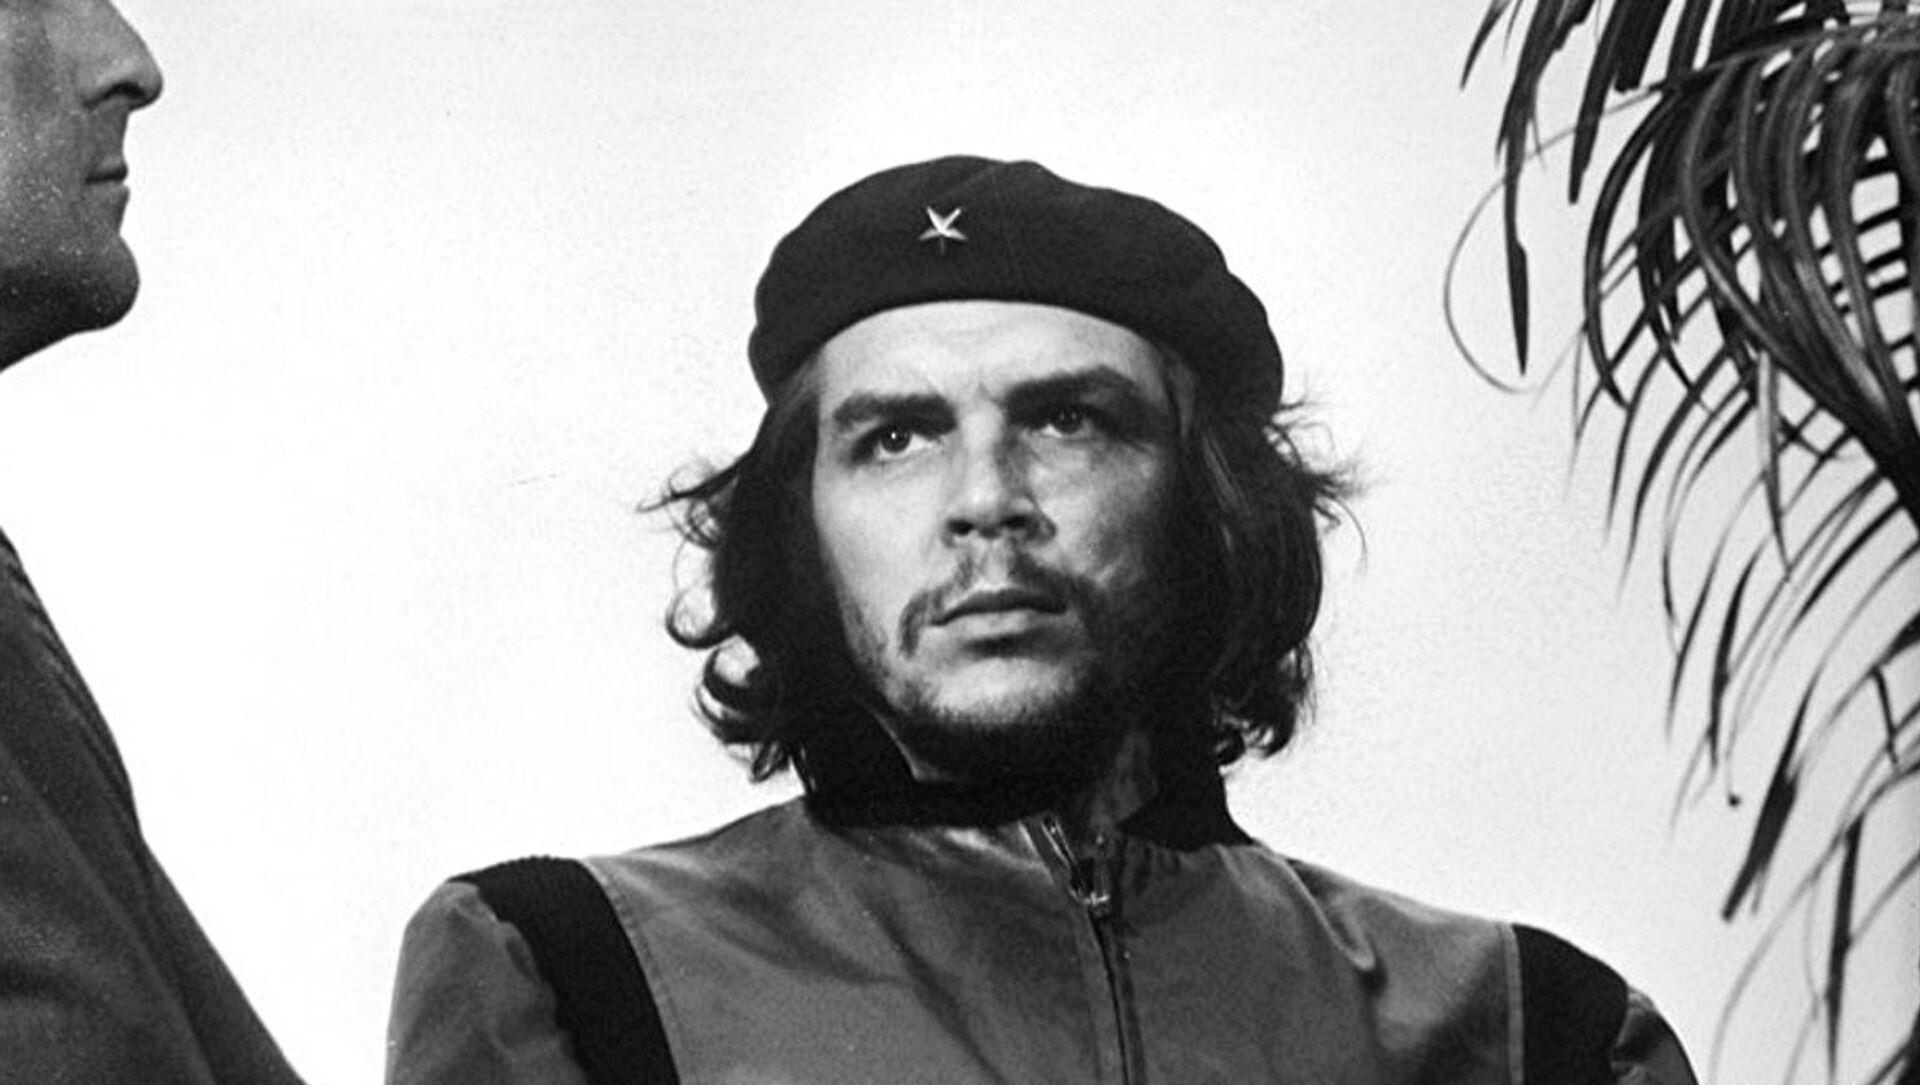 Comandante Ernesto Che Guevara, revolucionario cubano - Sputnik Mundo, 1920, 05.03.2019